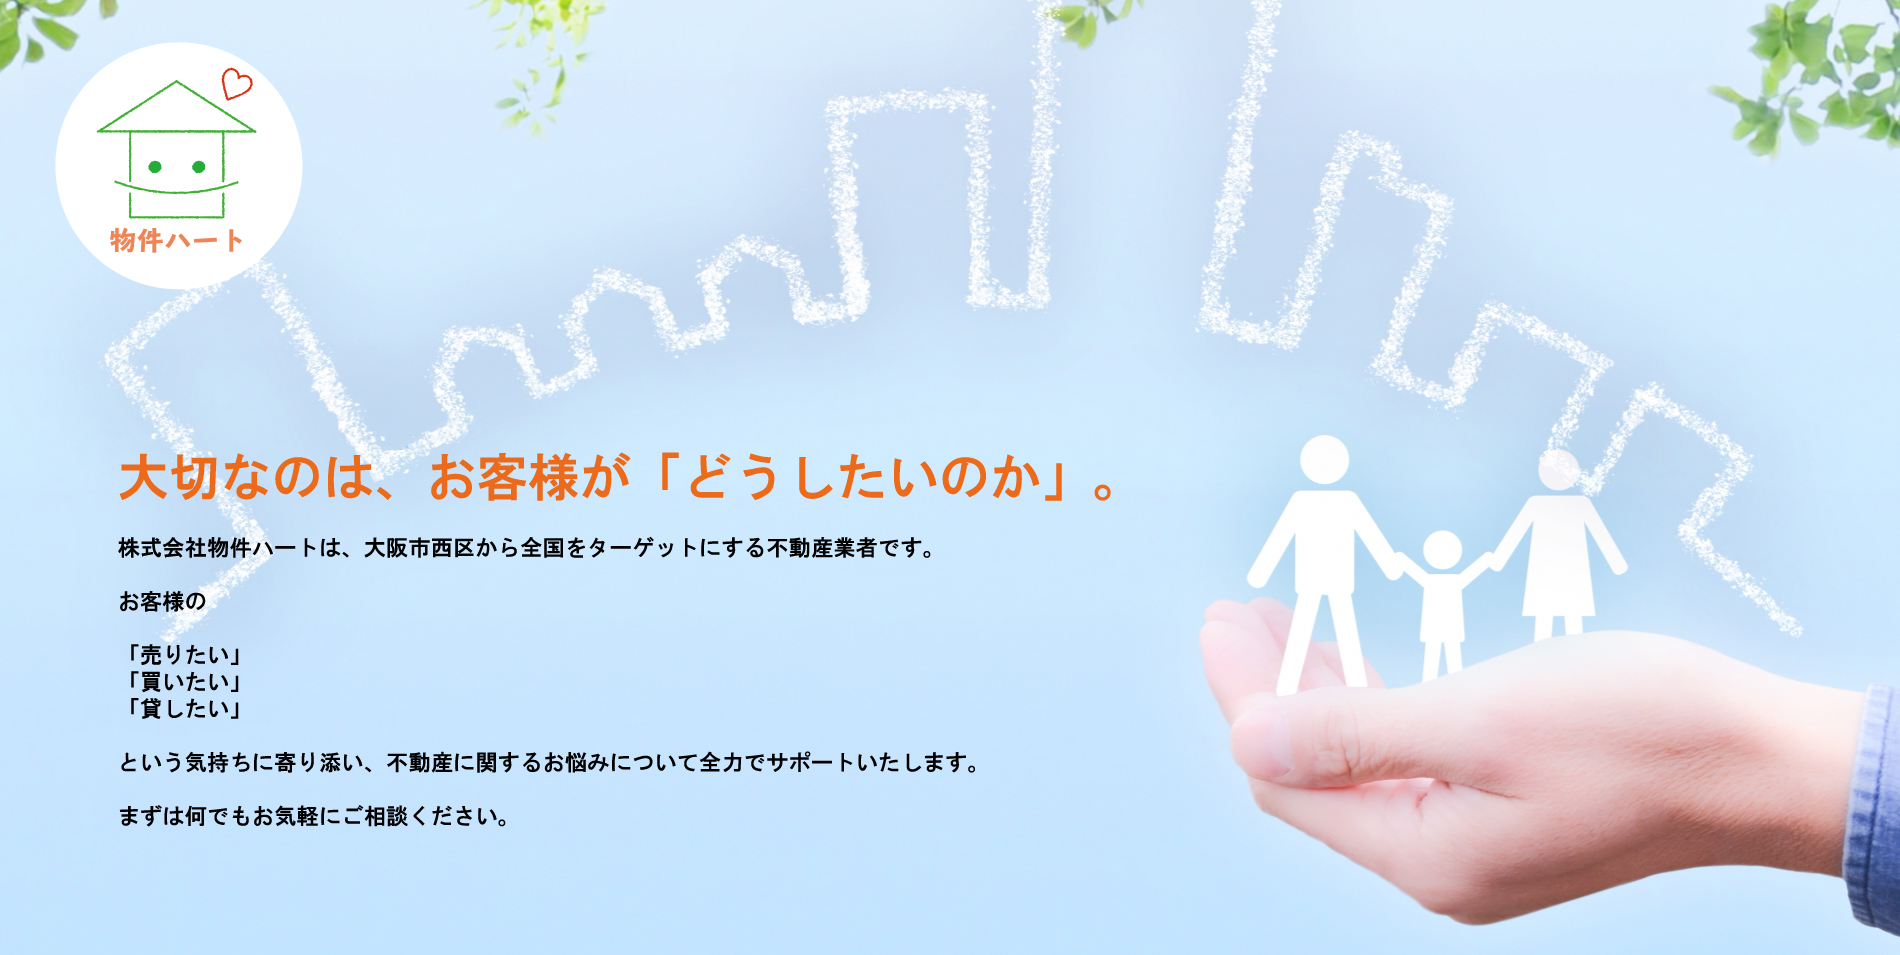 株式会社物件ハート|大阪市西区の不動産仲介業者